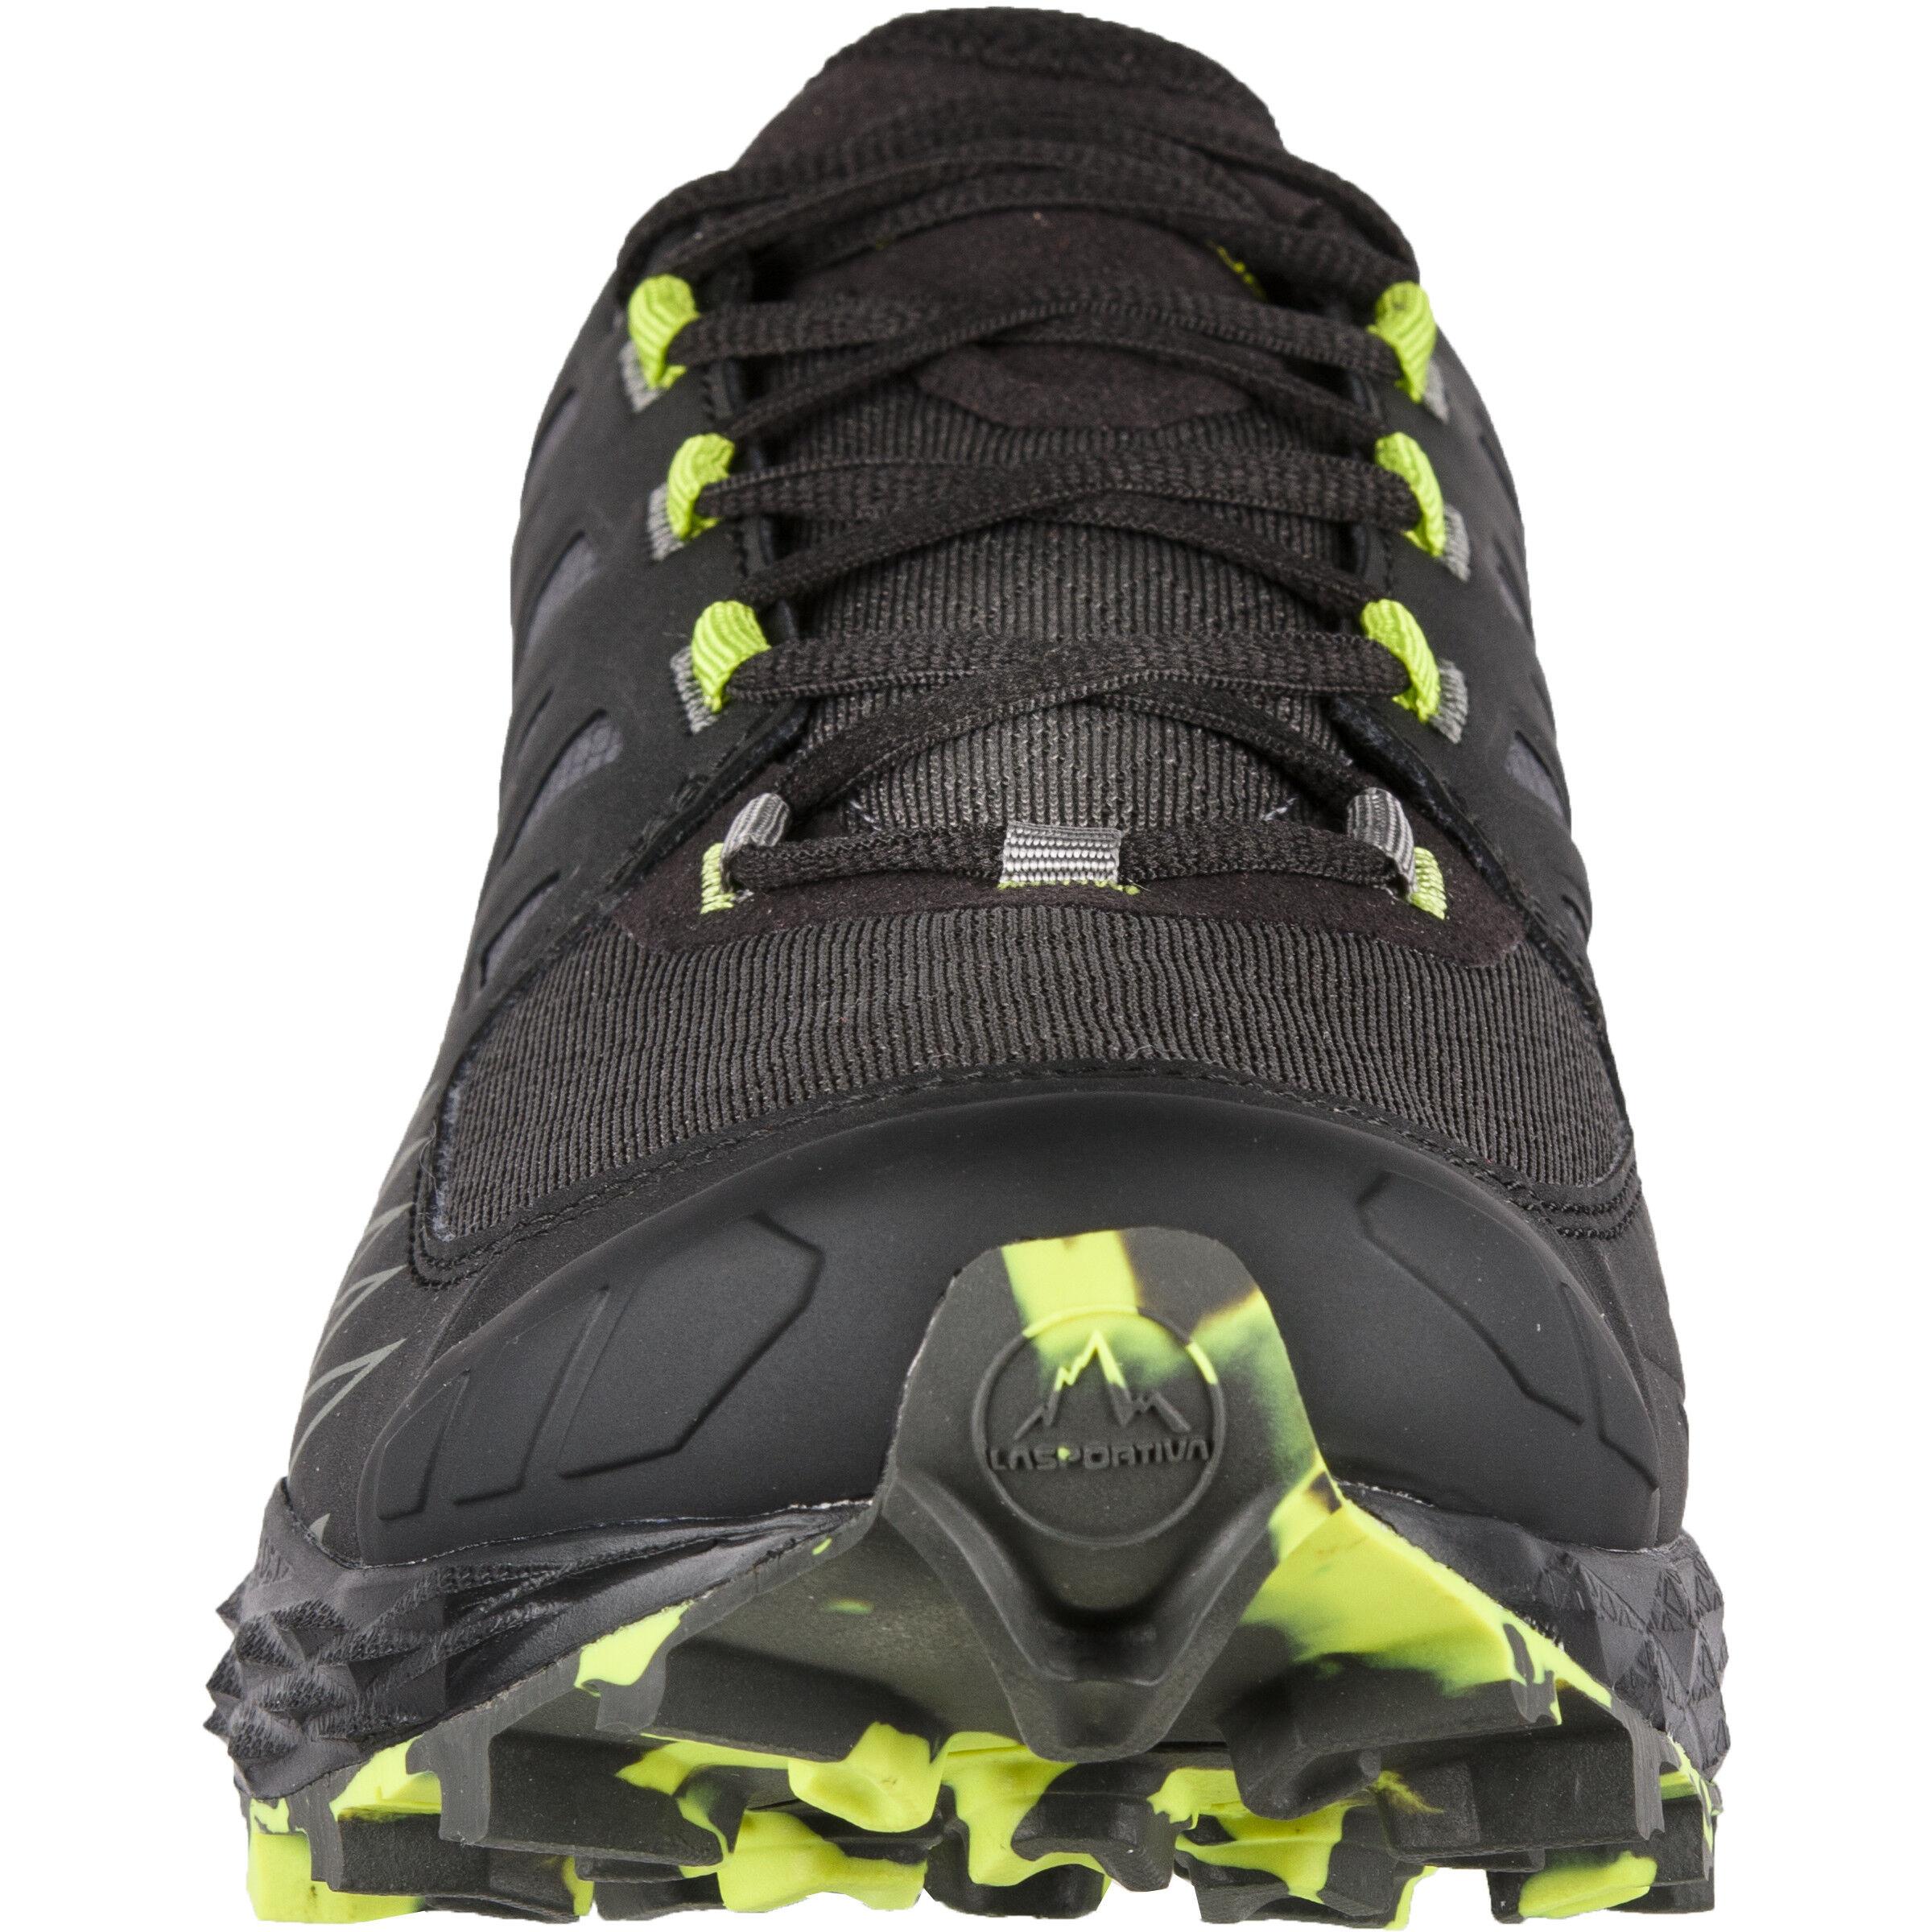 La Sportiva Lycan GTX Black Poppy trail running shoes